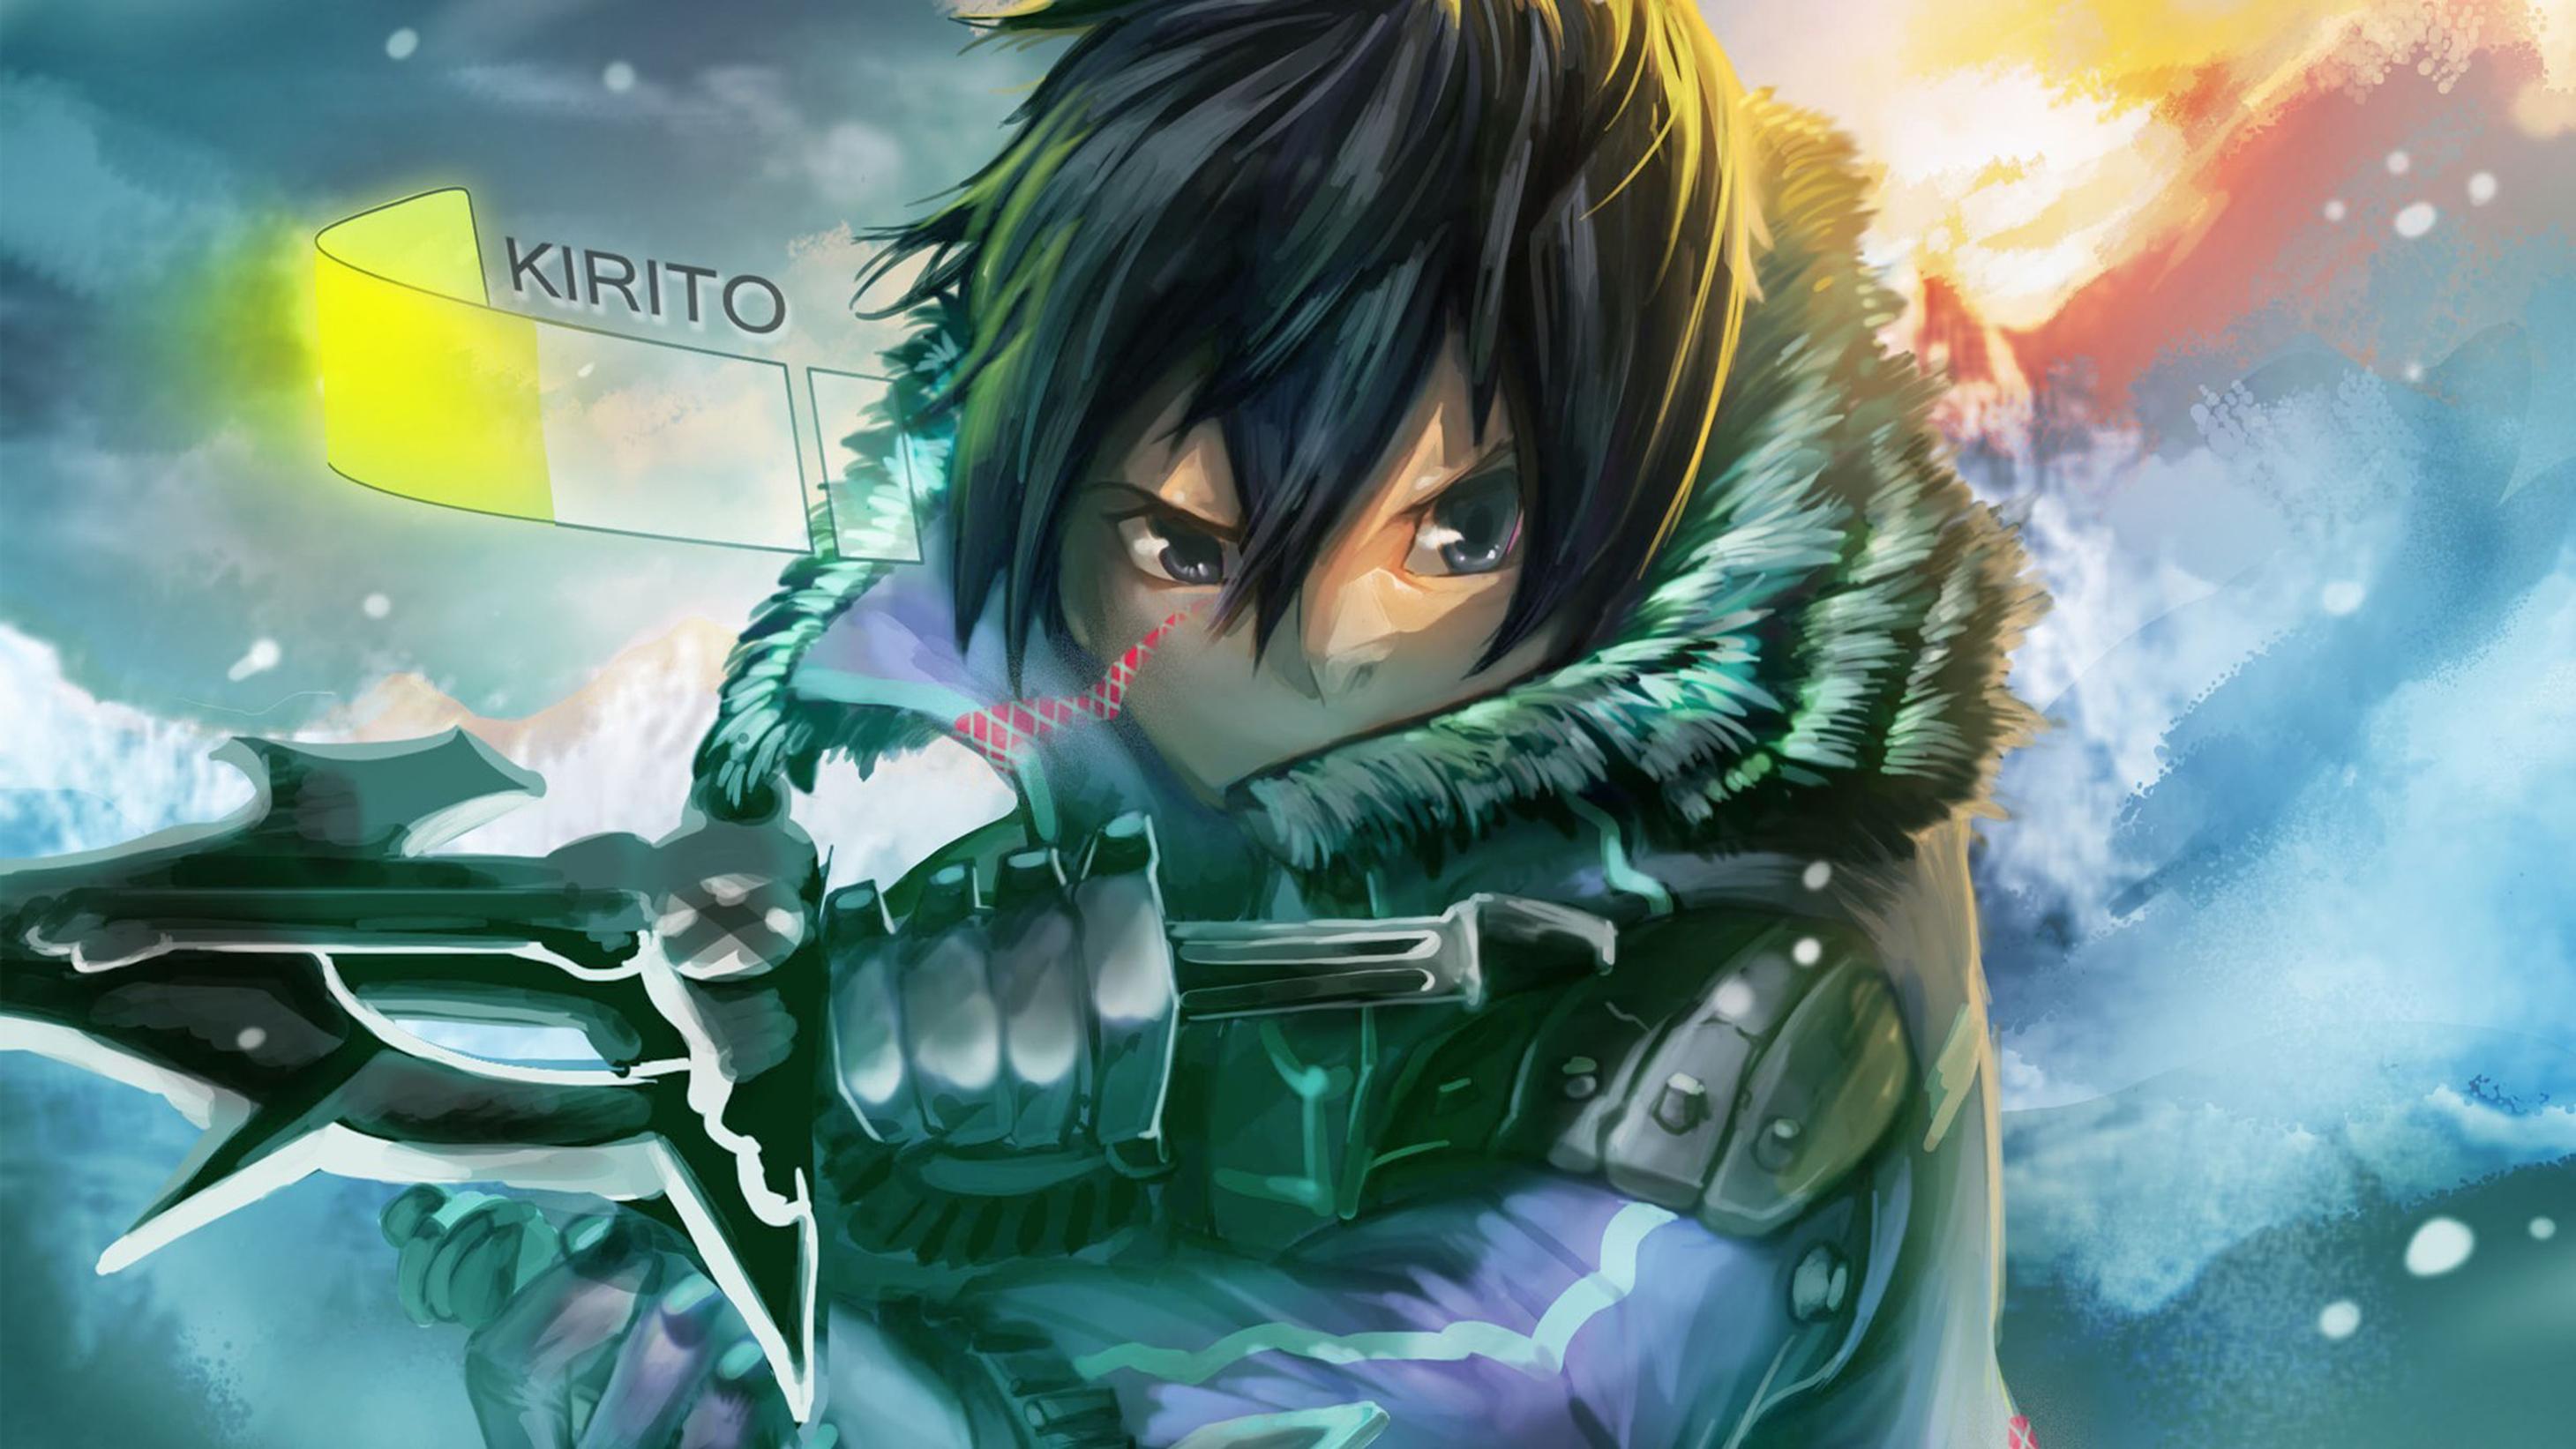 Anime Asuna Yuuki Kirigaya Kazuto Kirito Sword Art Online HD Wallpaper